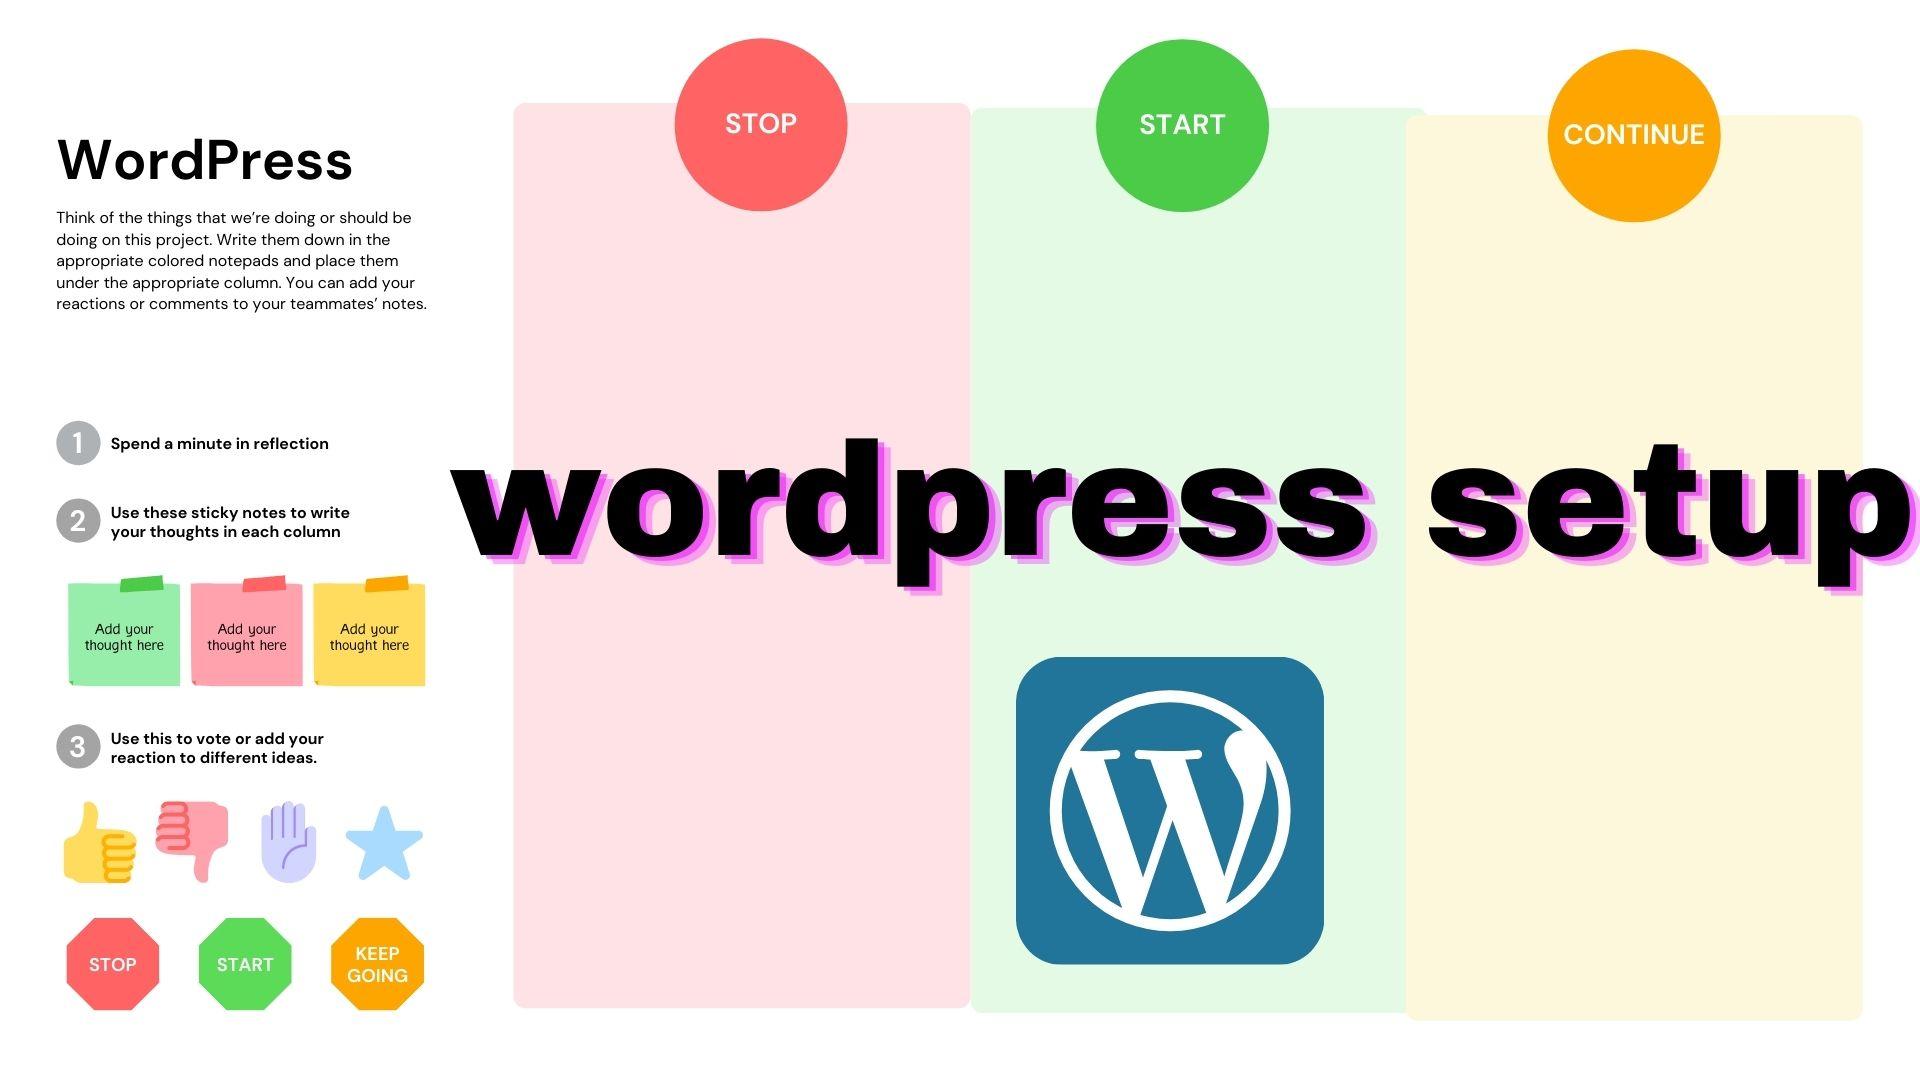 I will install WordPress, setup theme and do some customization